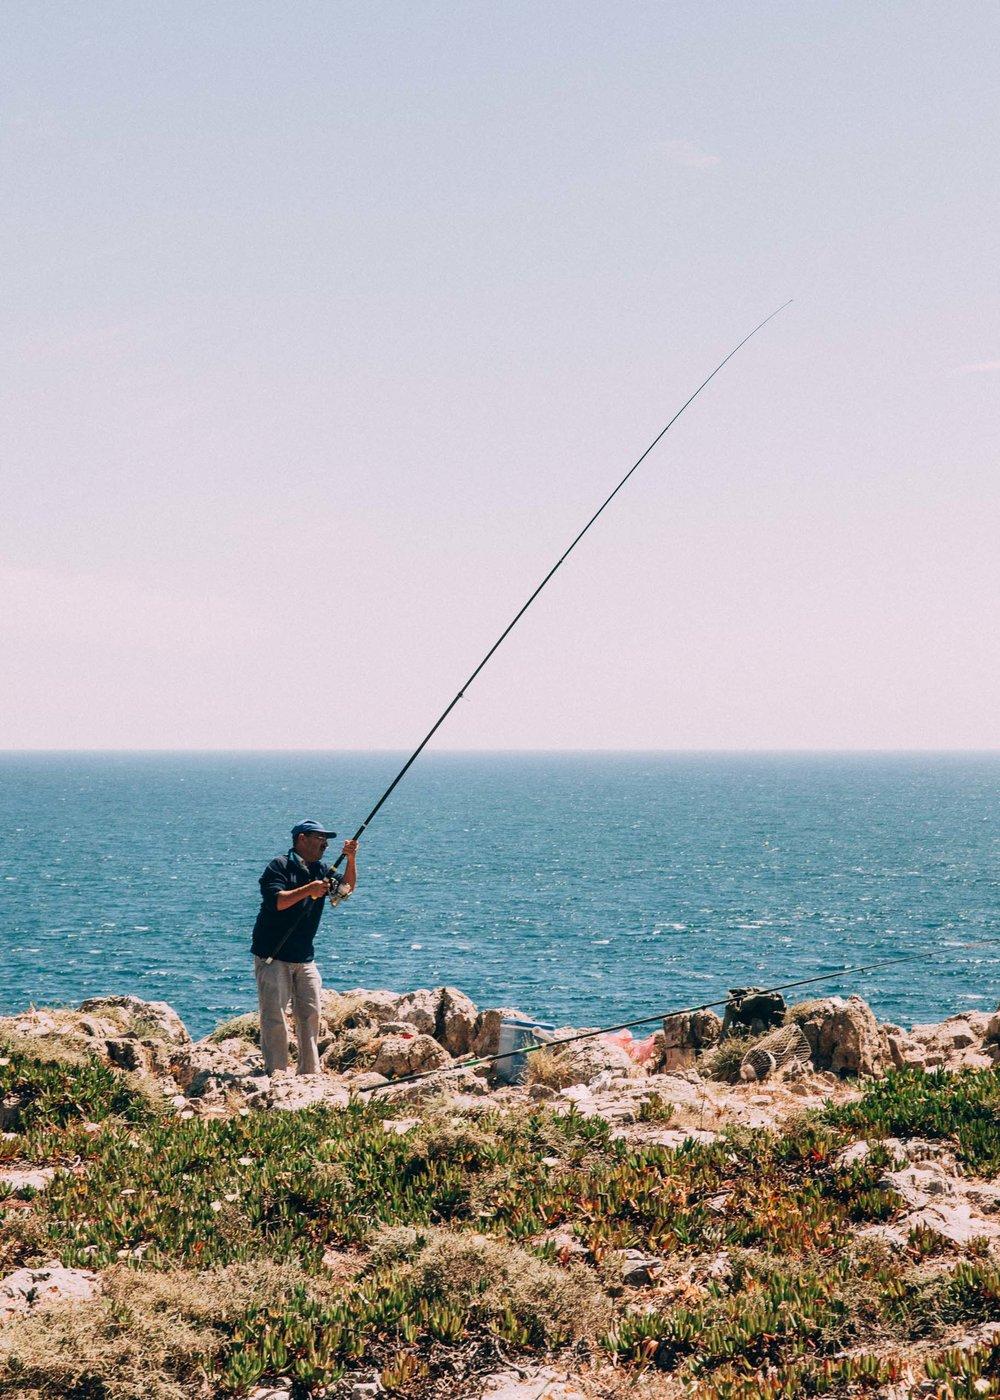 MaxHartmannphoto_Algarve2017-2750.jpg